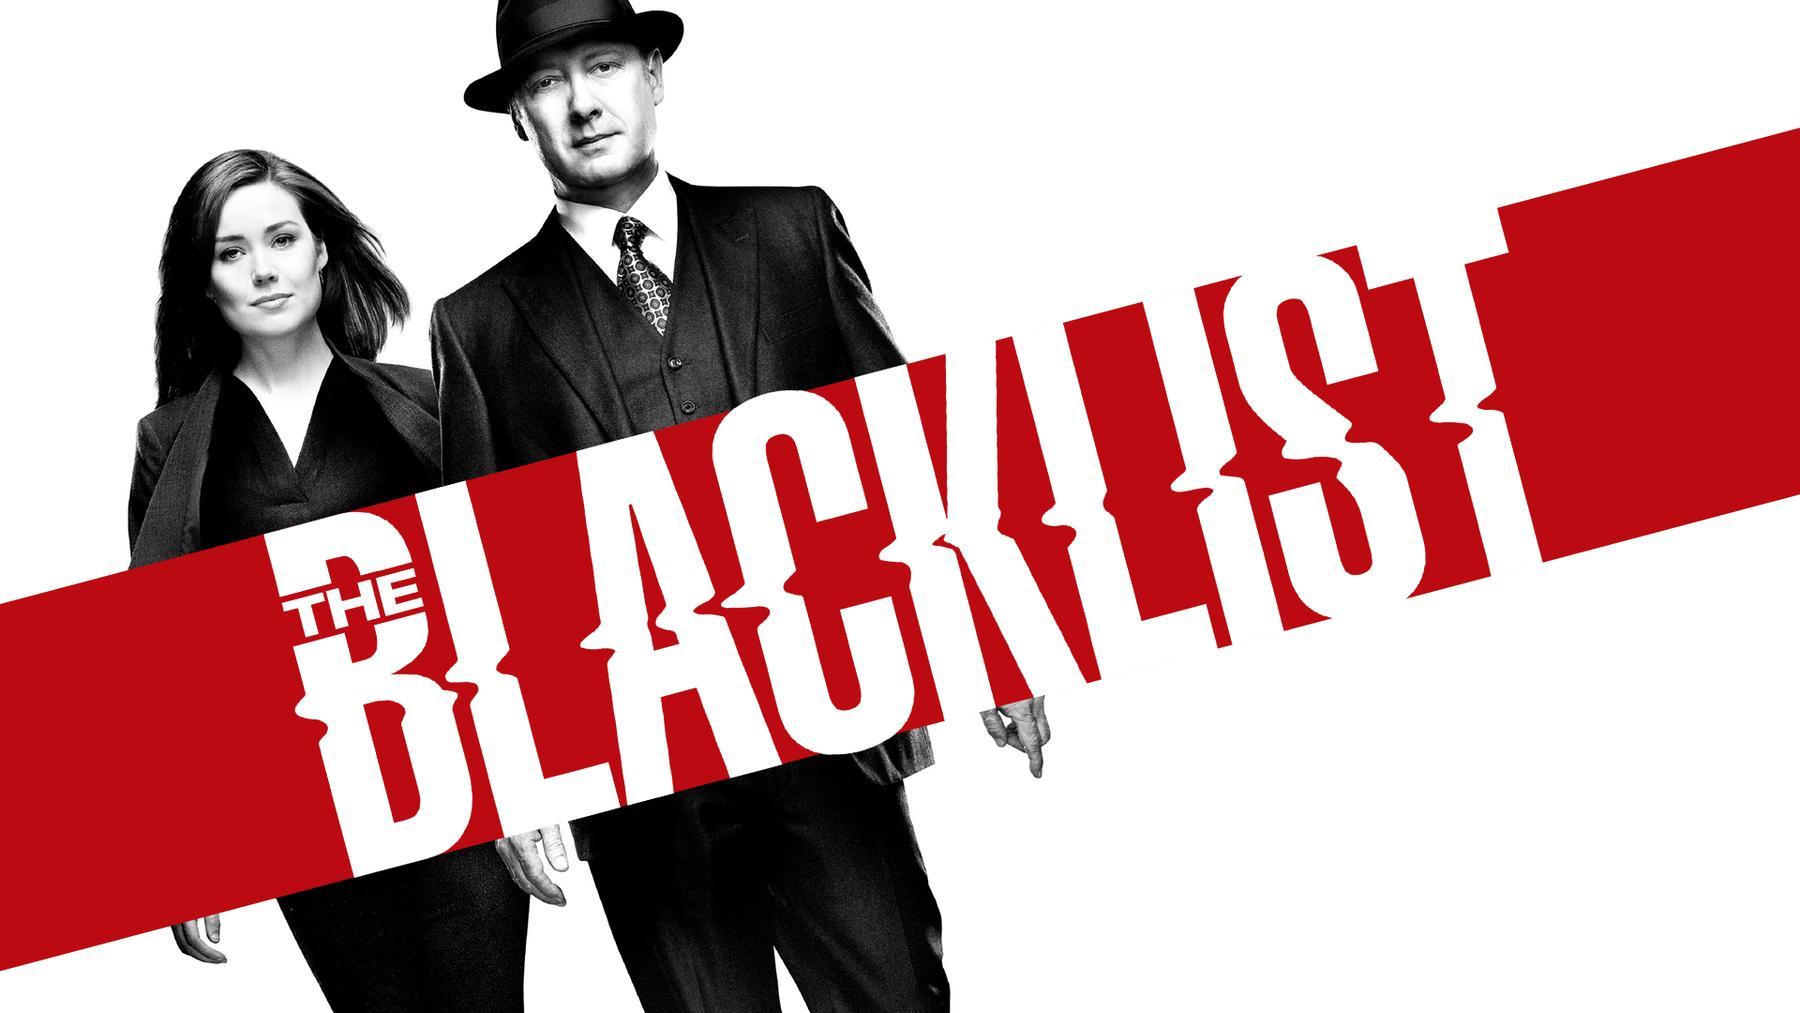 The Blacklist - NOW!